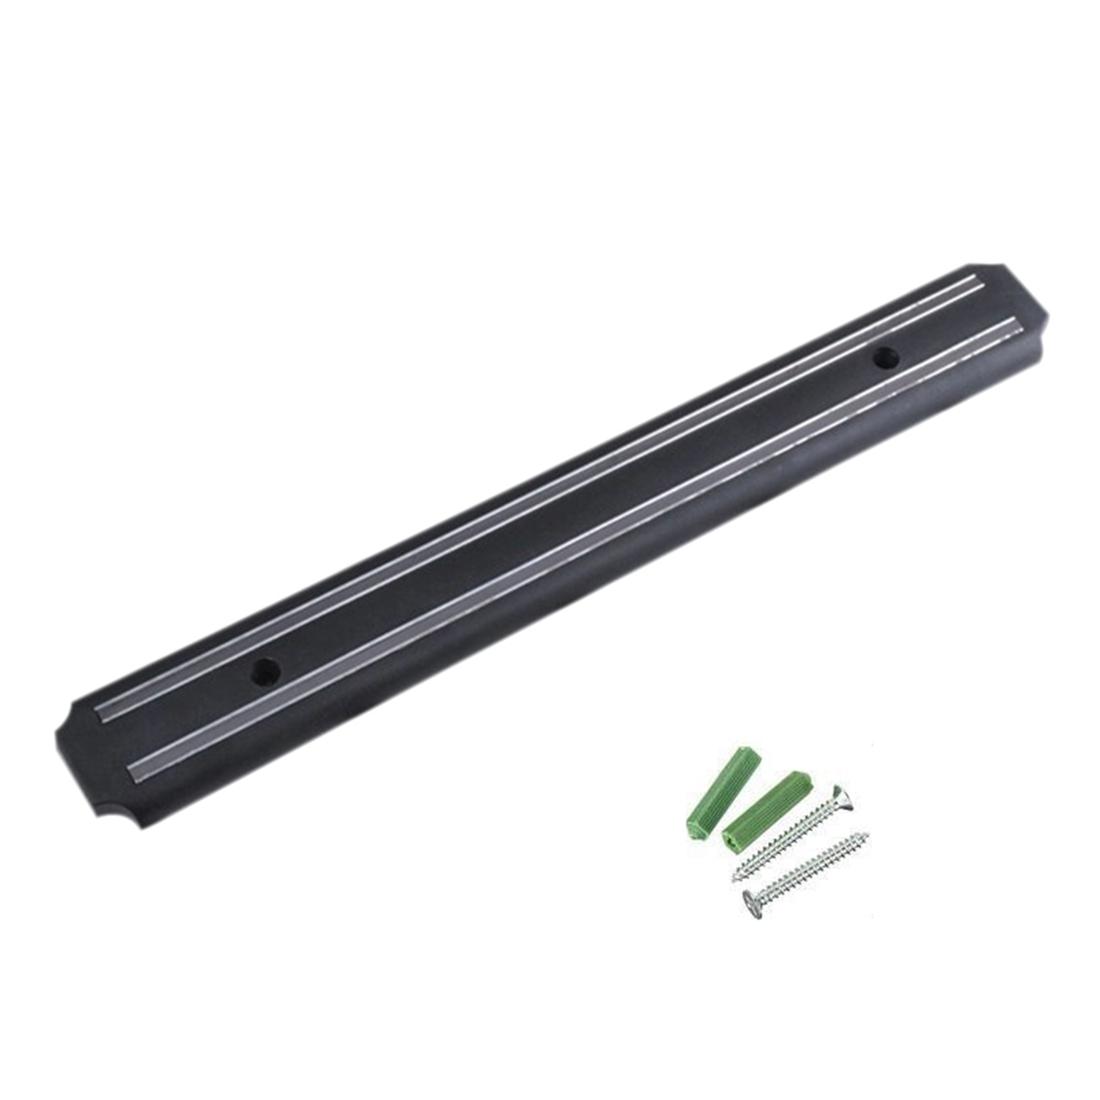 wall mounted magnetic knife storage holder chef rack strip utensil kitchen hy ebay. Black Bedroom Furniture Sets. Home Design Ideas